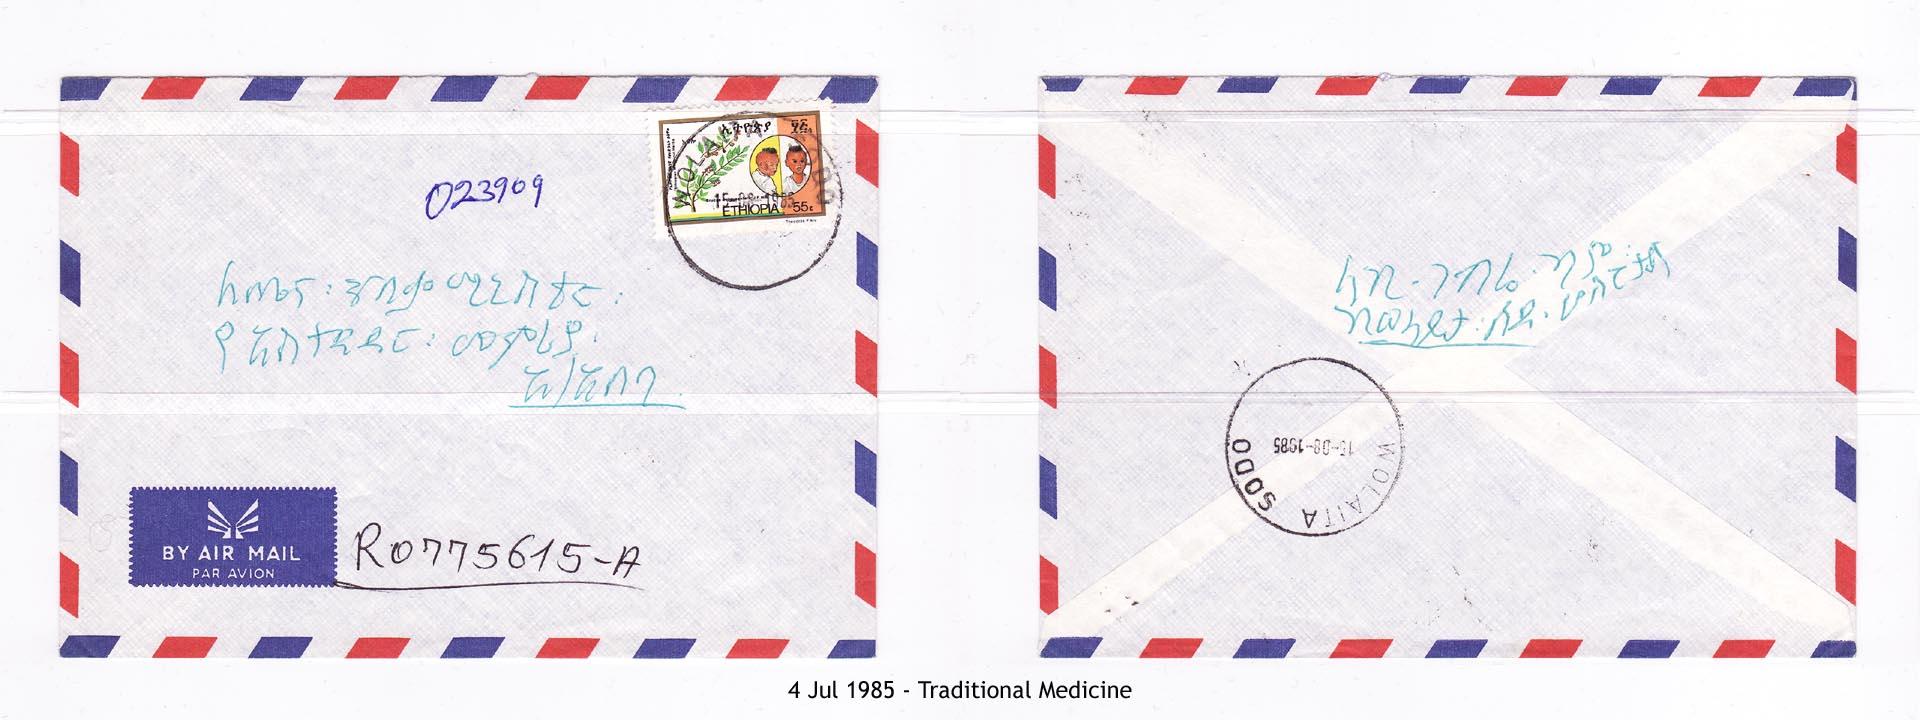 19850704 - Traditional Medicine